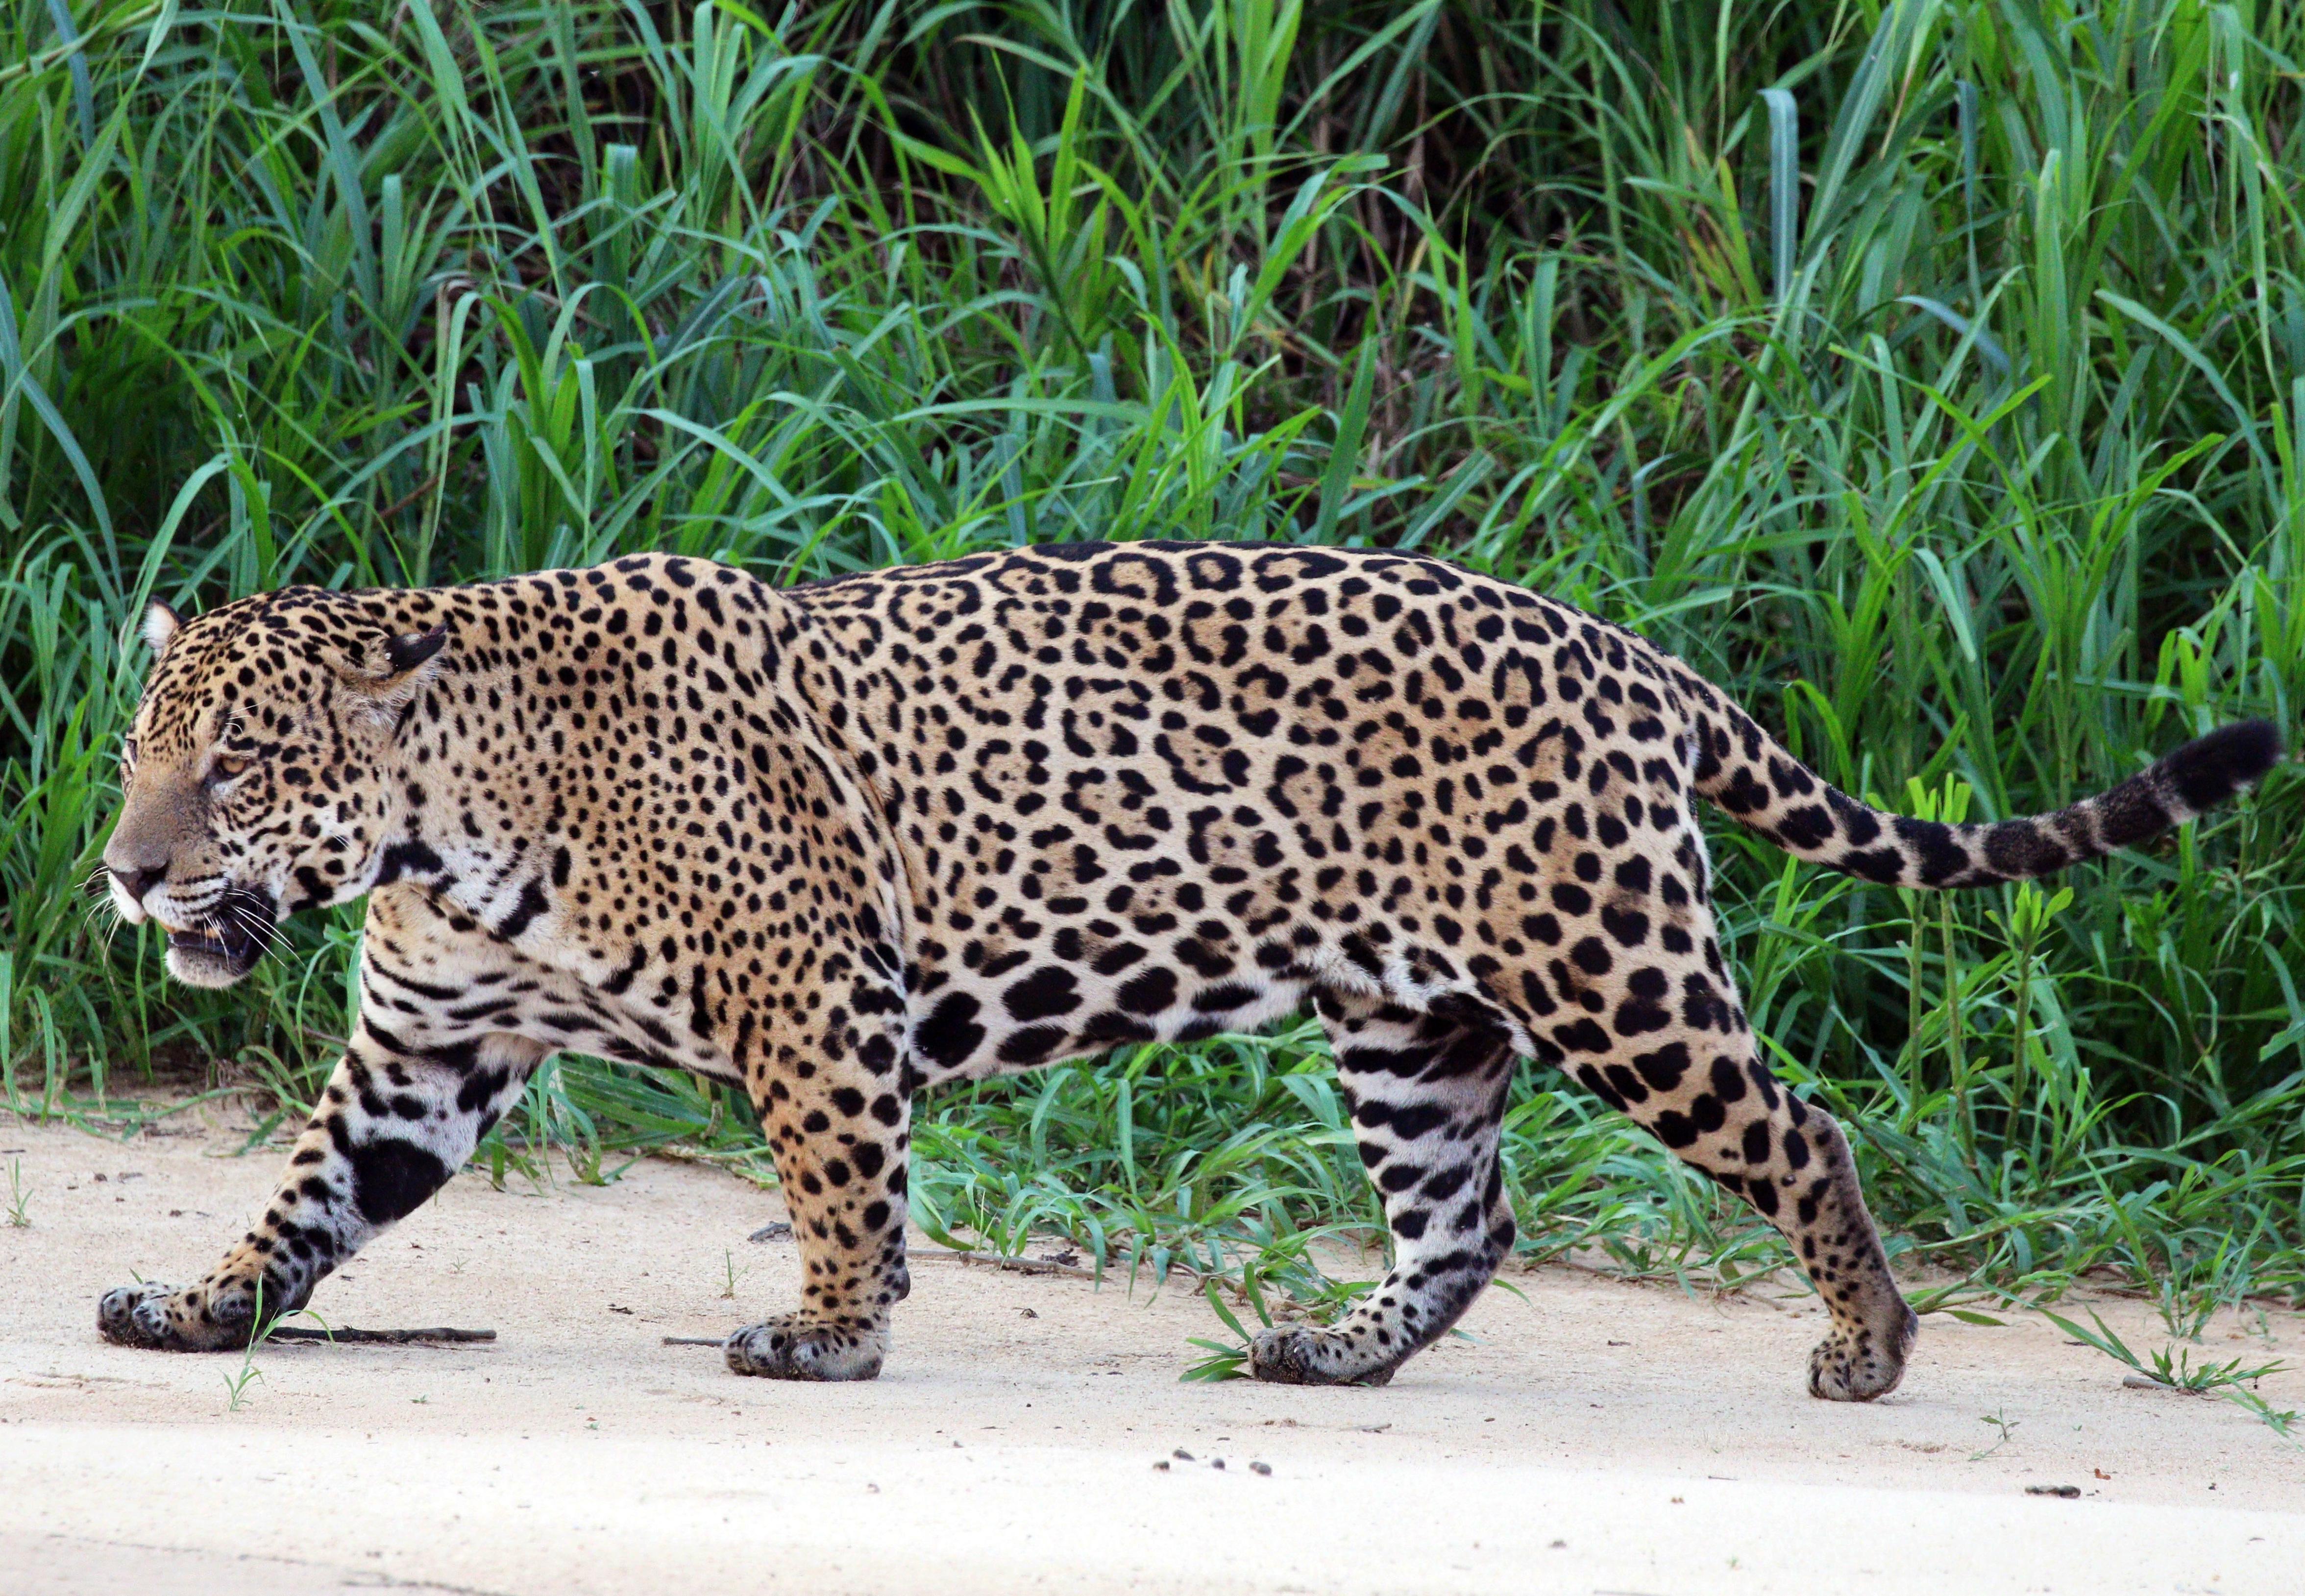 Jacksonville Big Cat Sanctuary